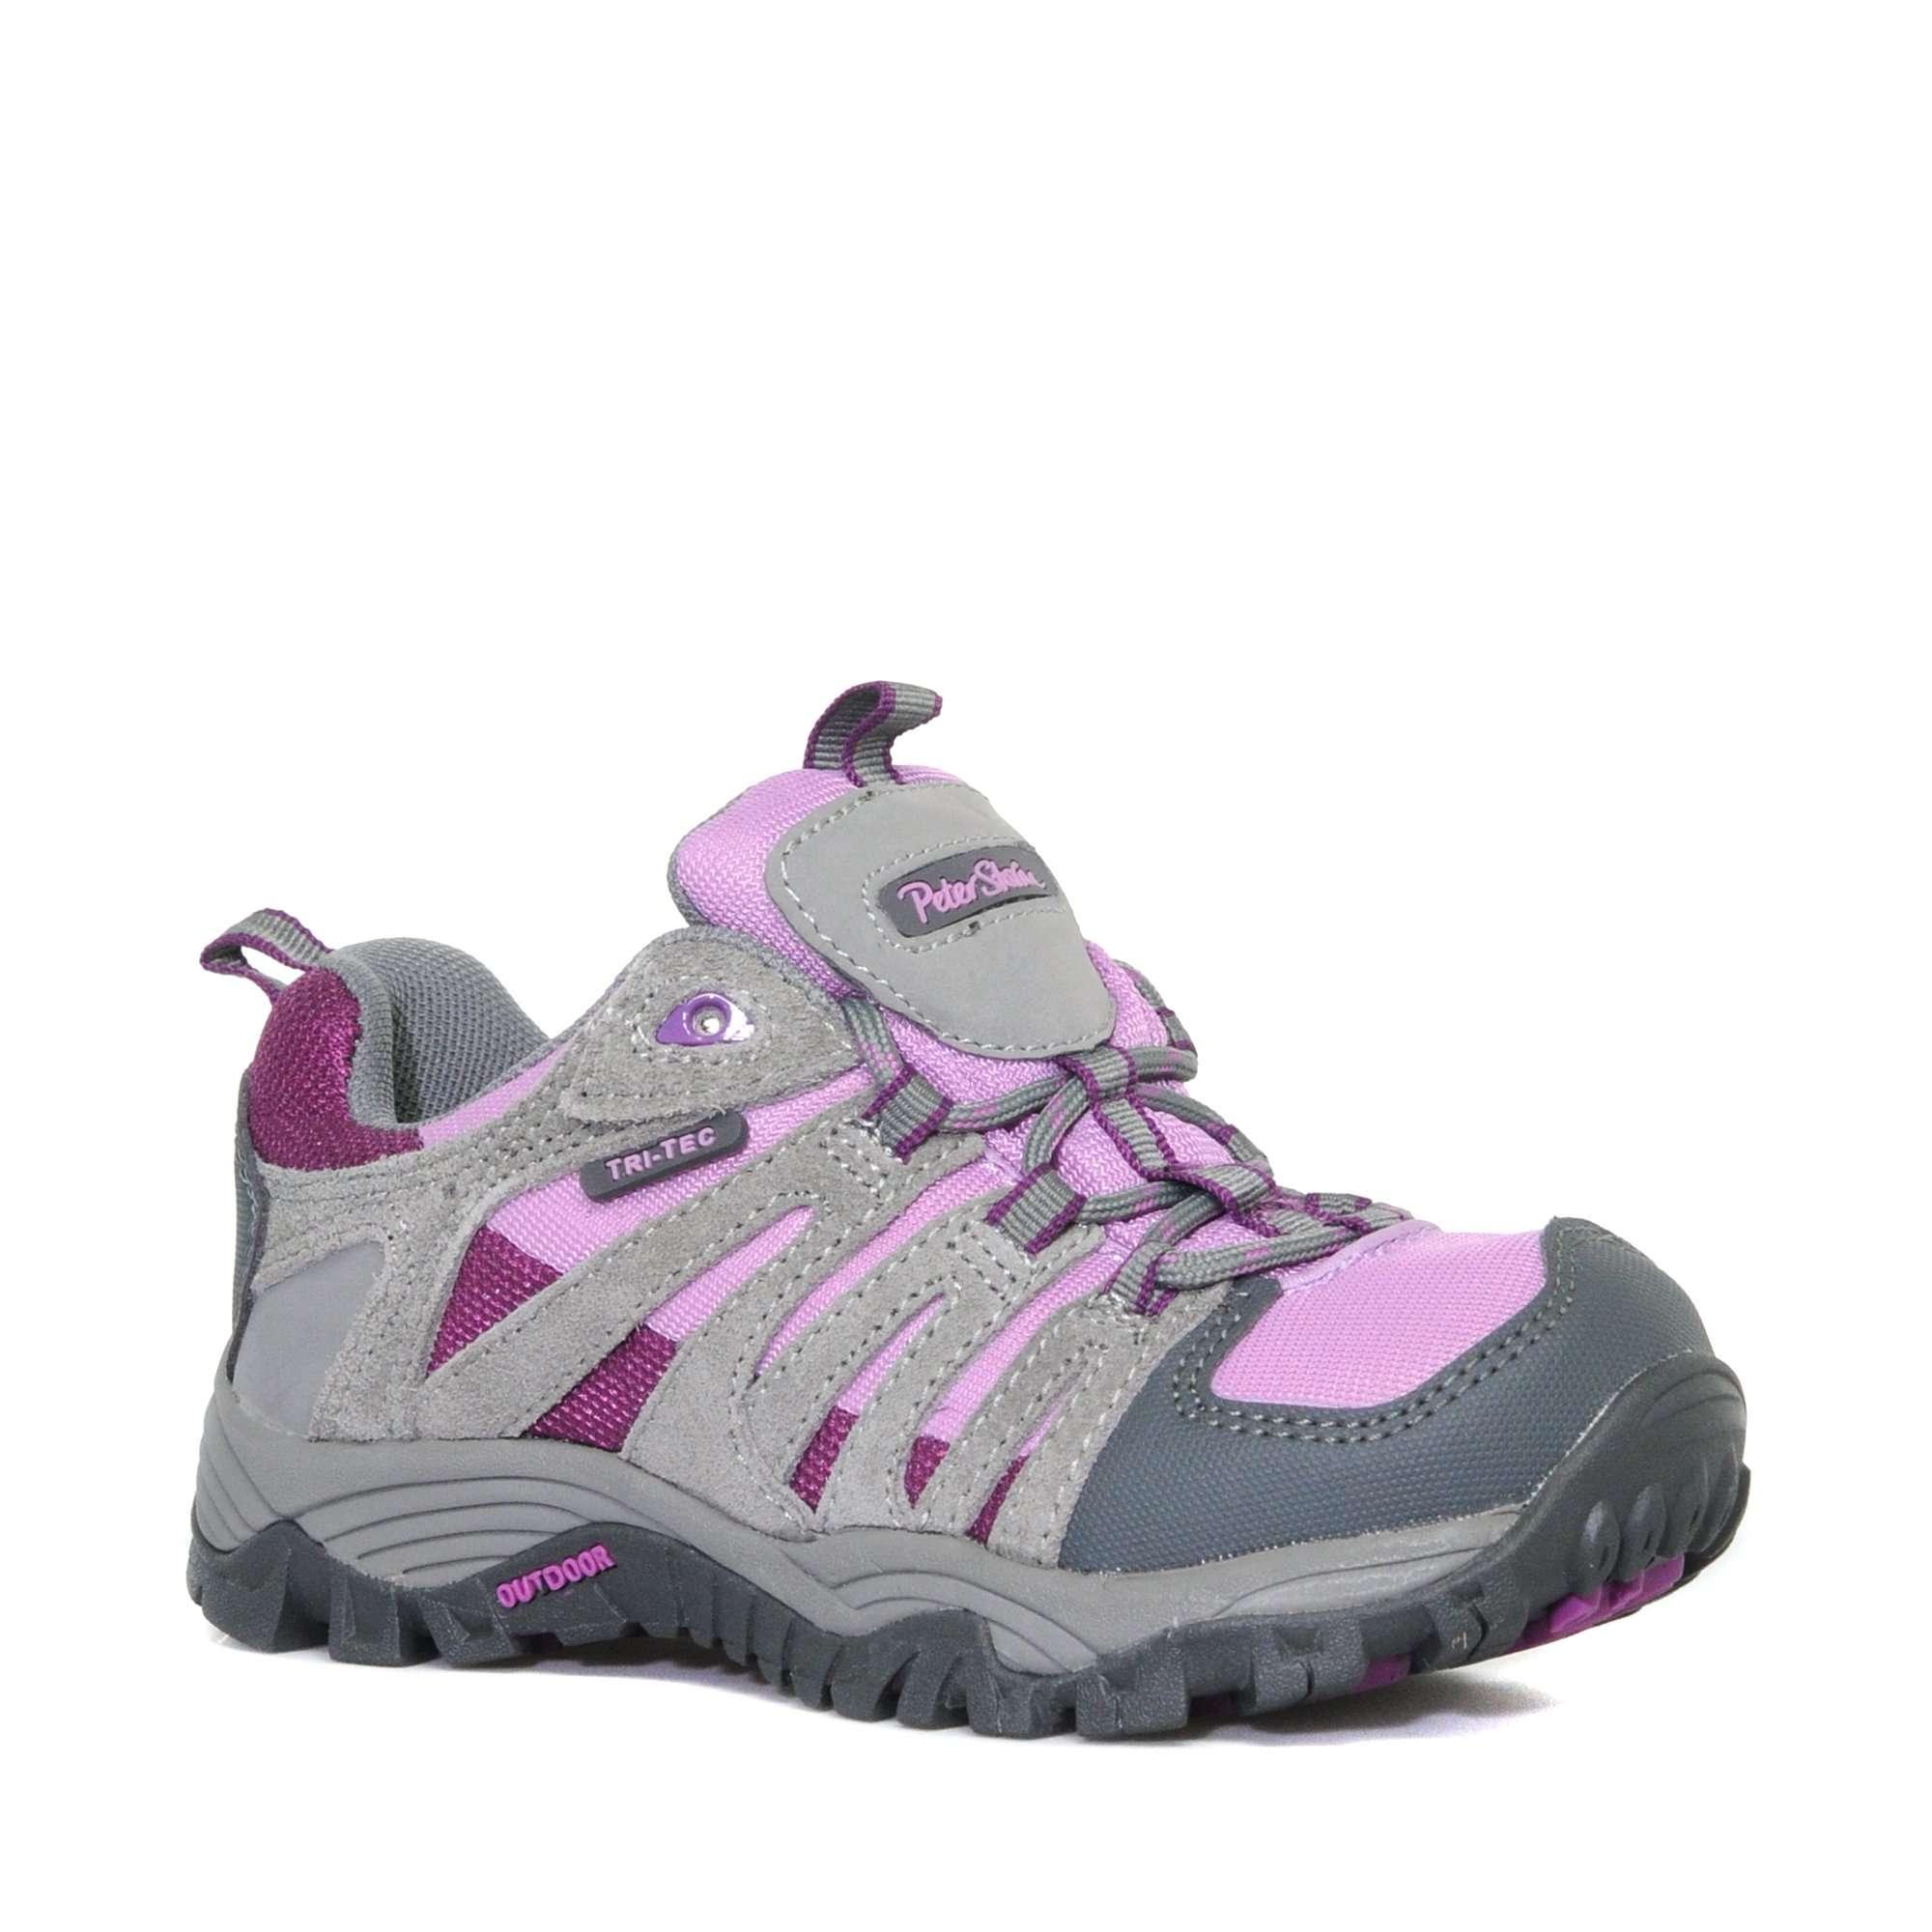 PETER STORM Girls' Barnston Hillwalking Shoe